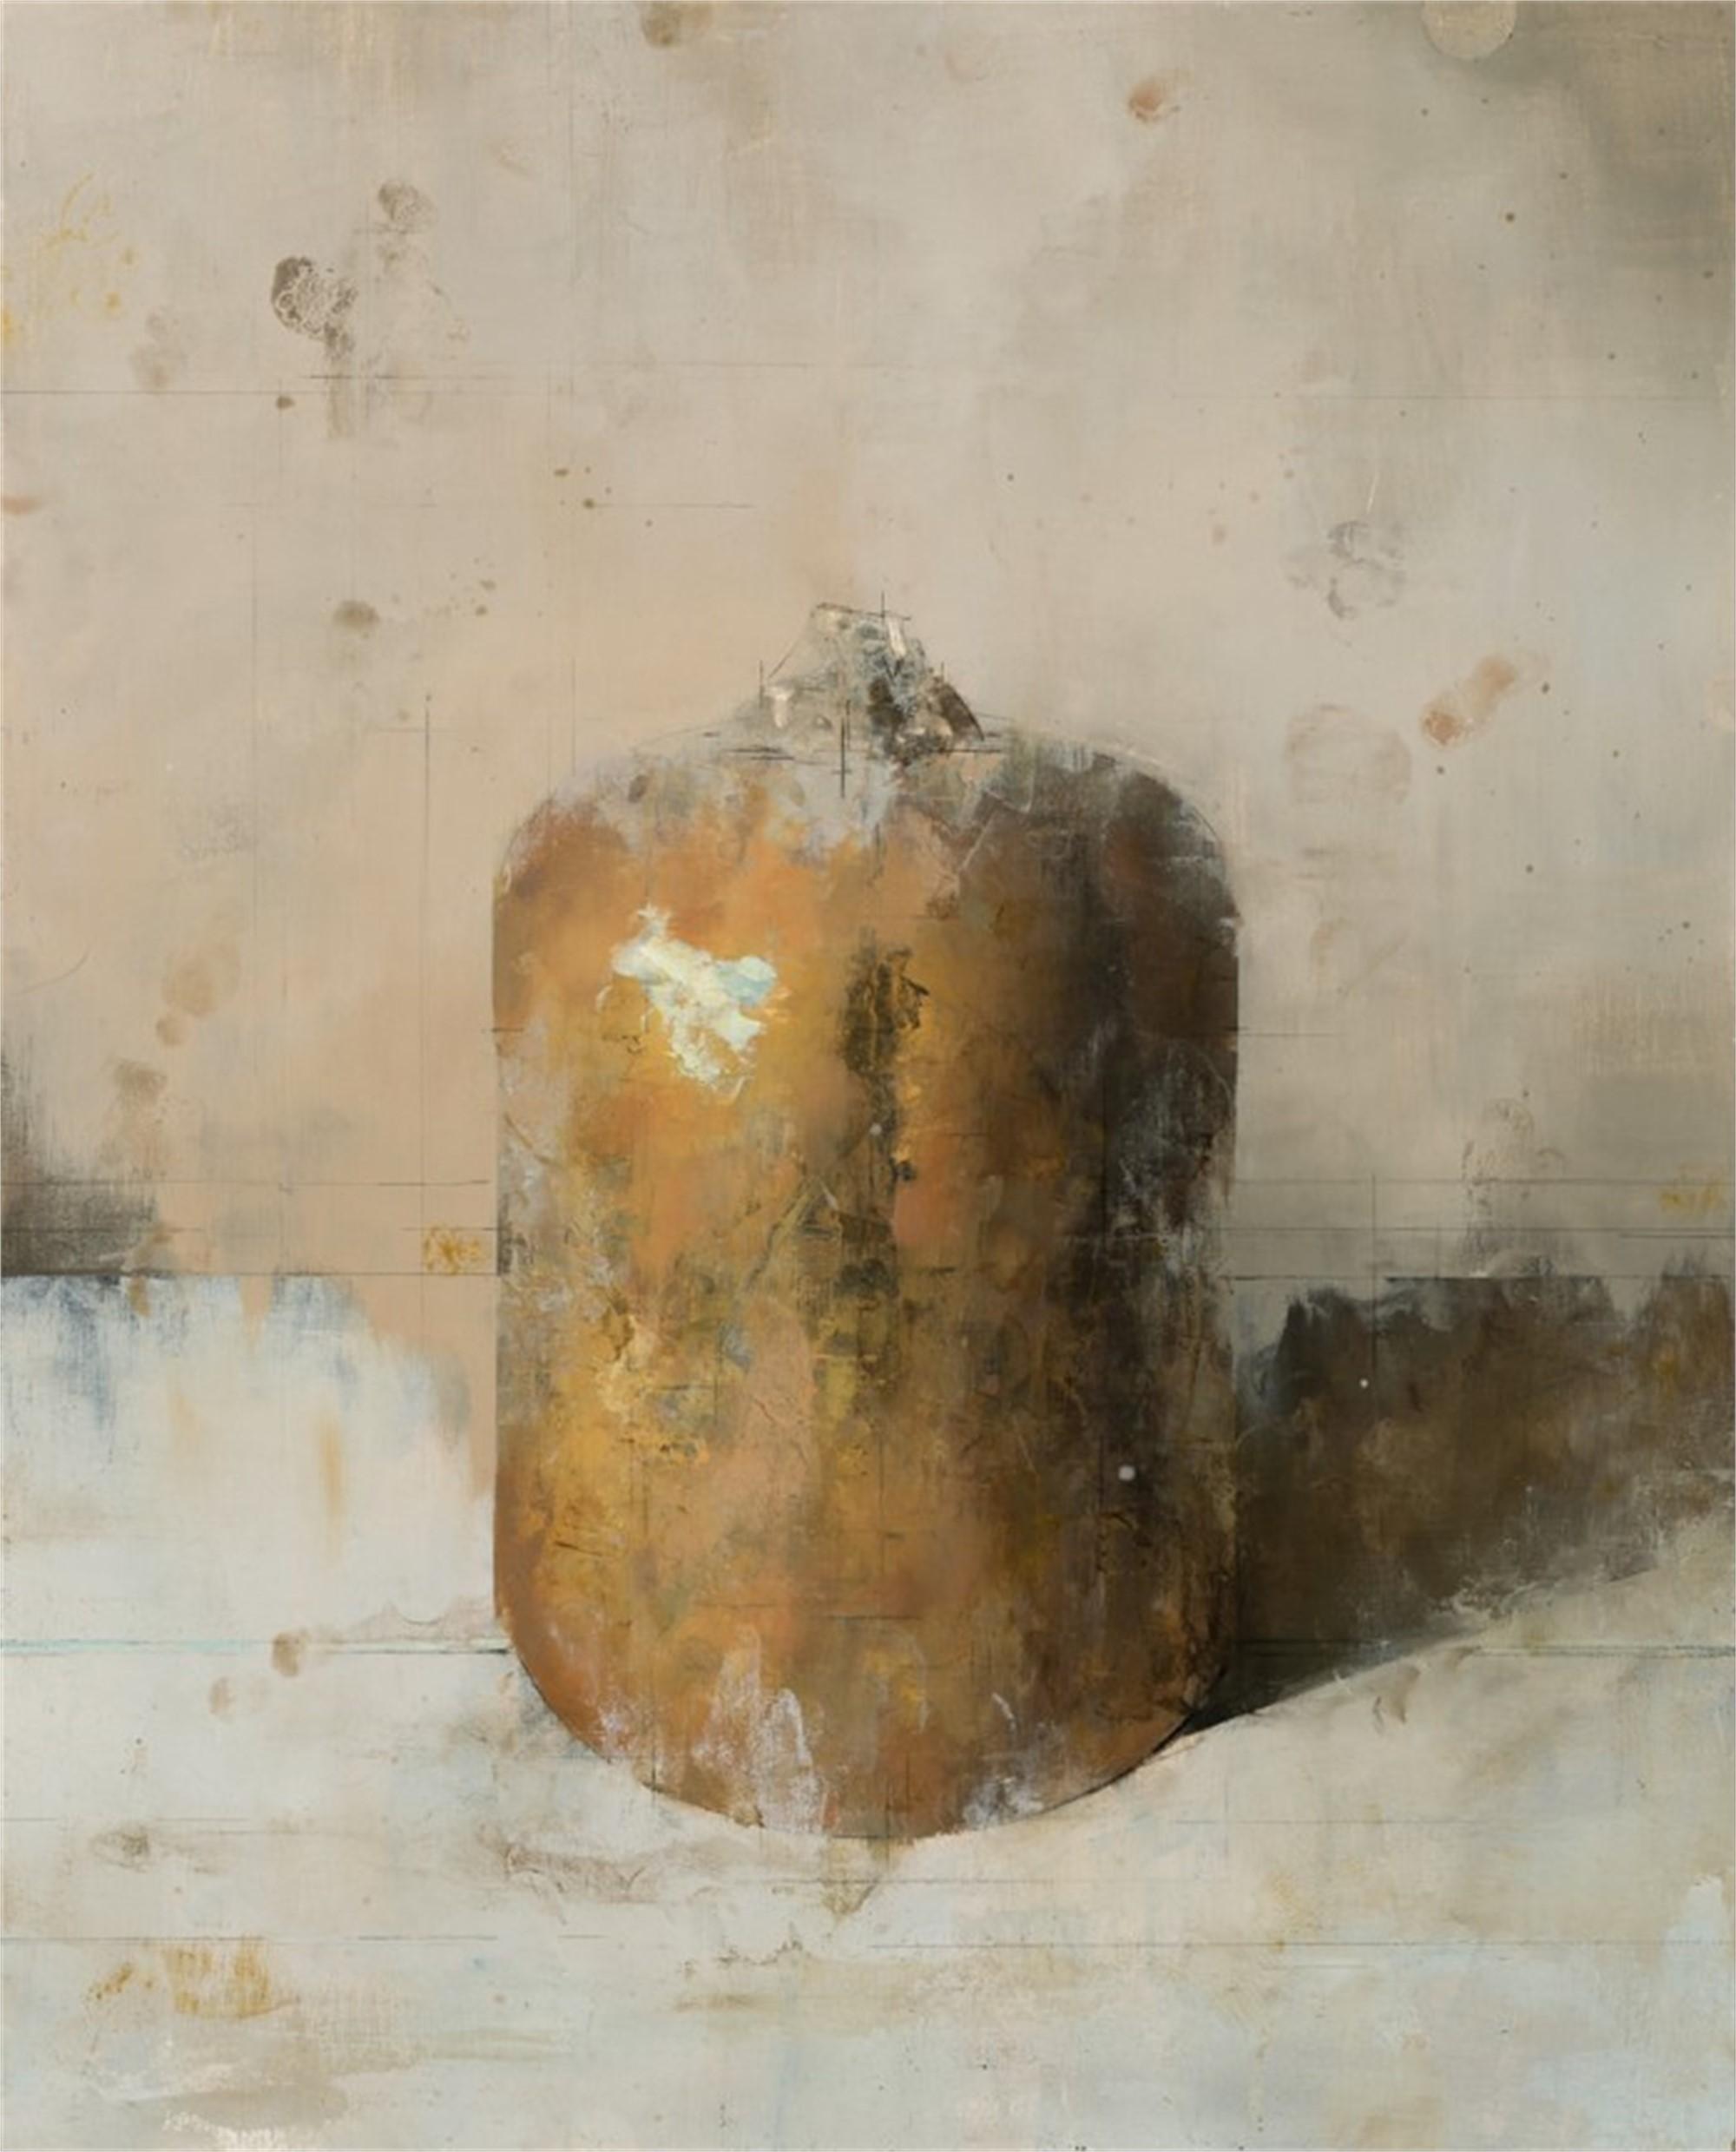 Crumbling Honey by Matthew Saba